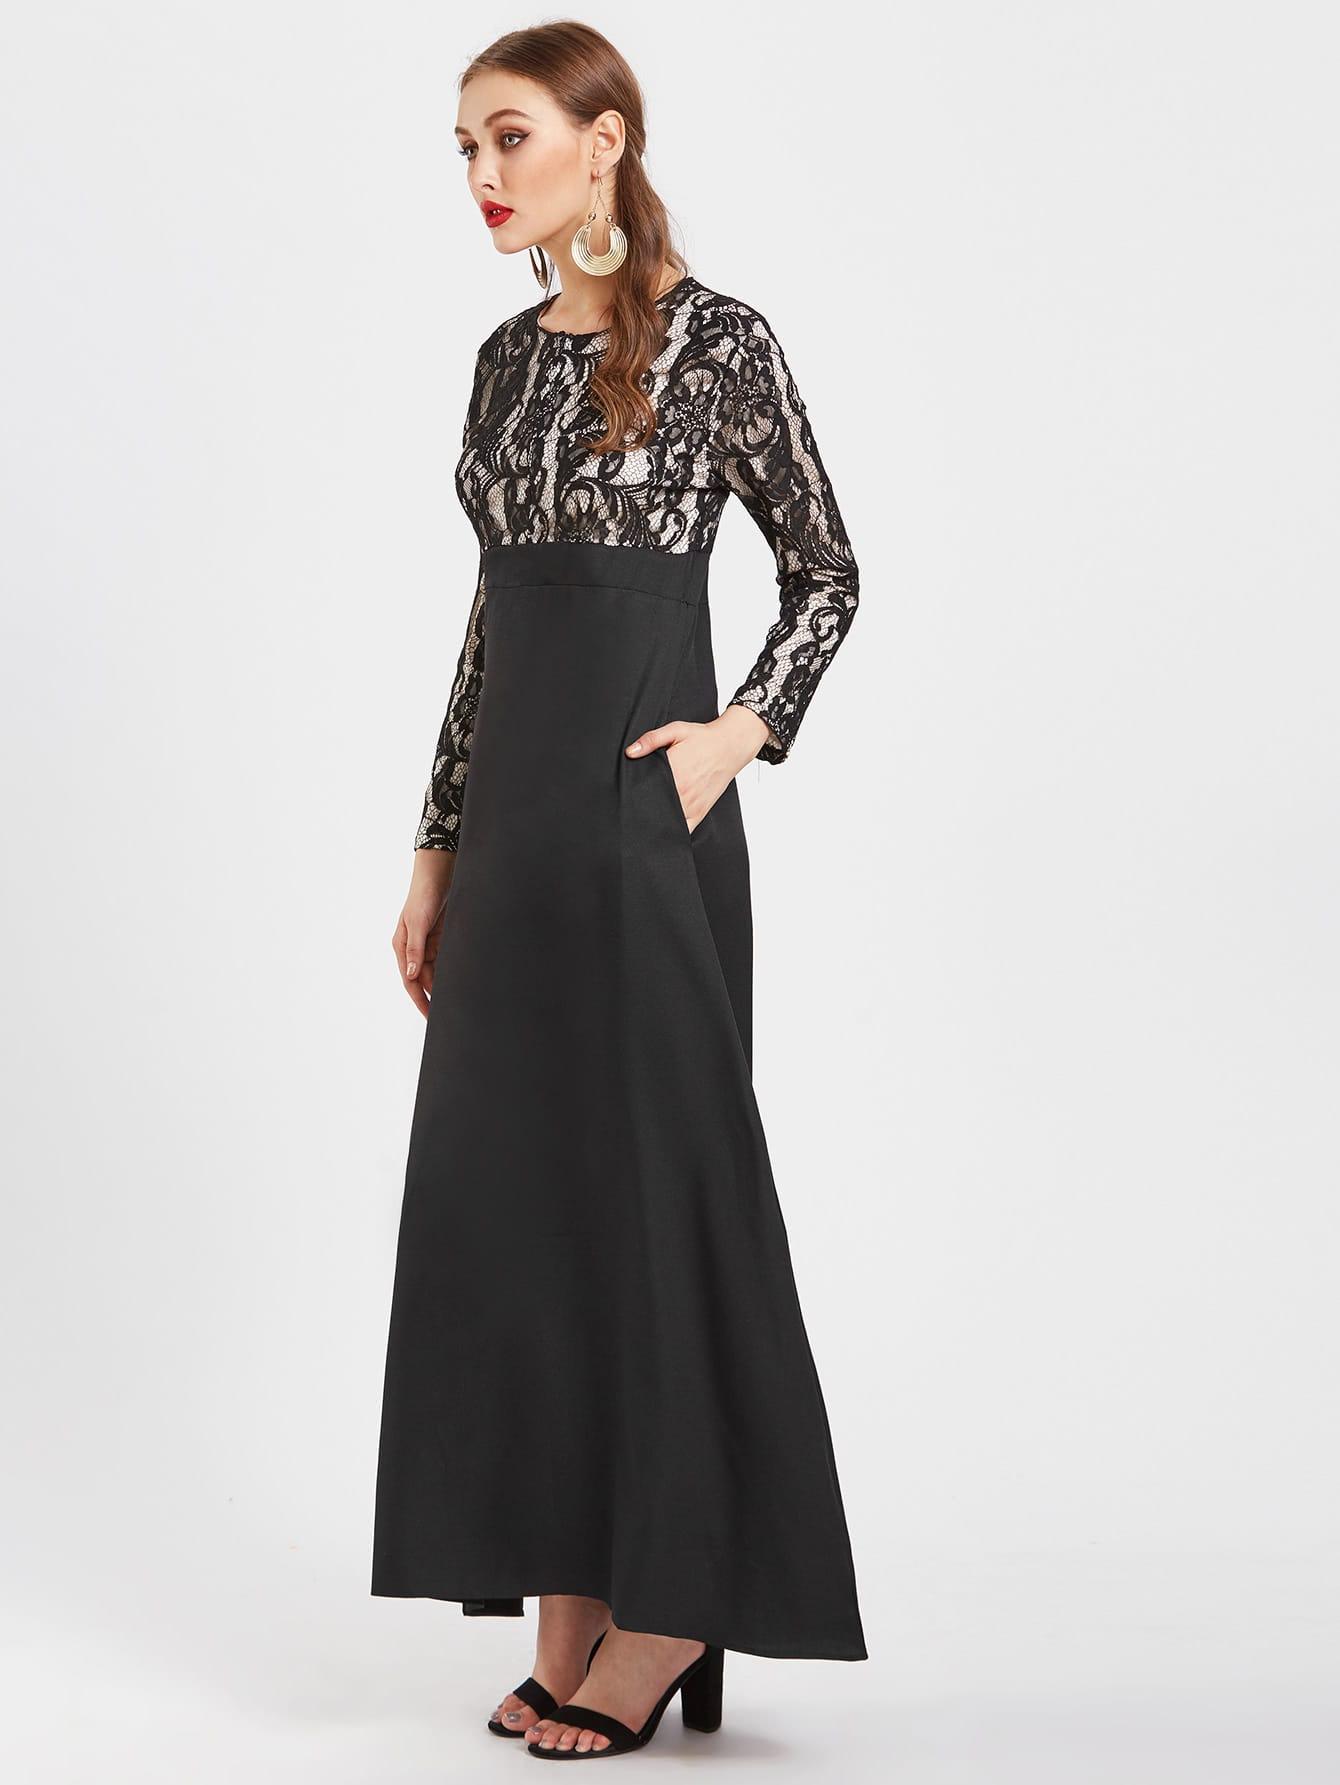 9c73451bb8 Buy Evening Gowns Online Australia